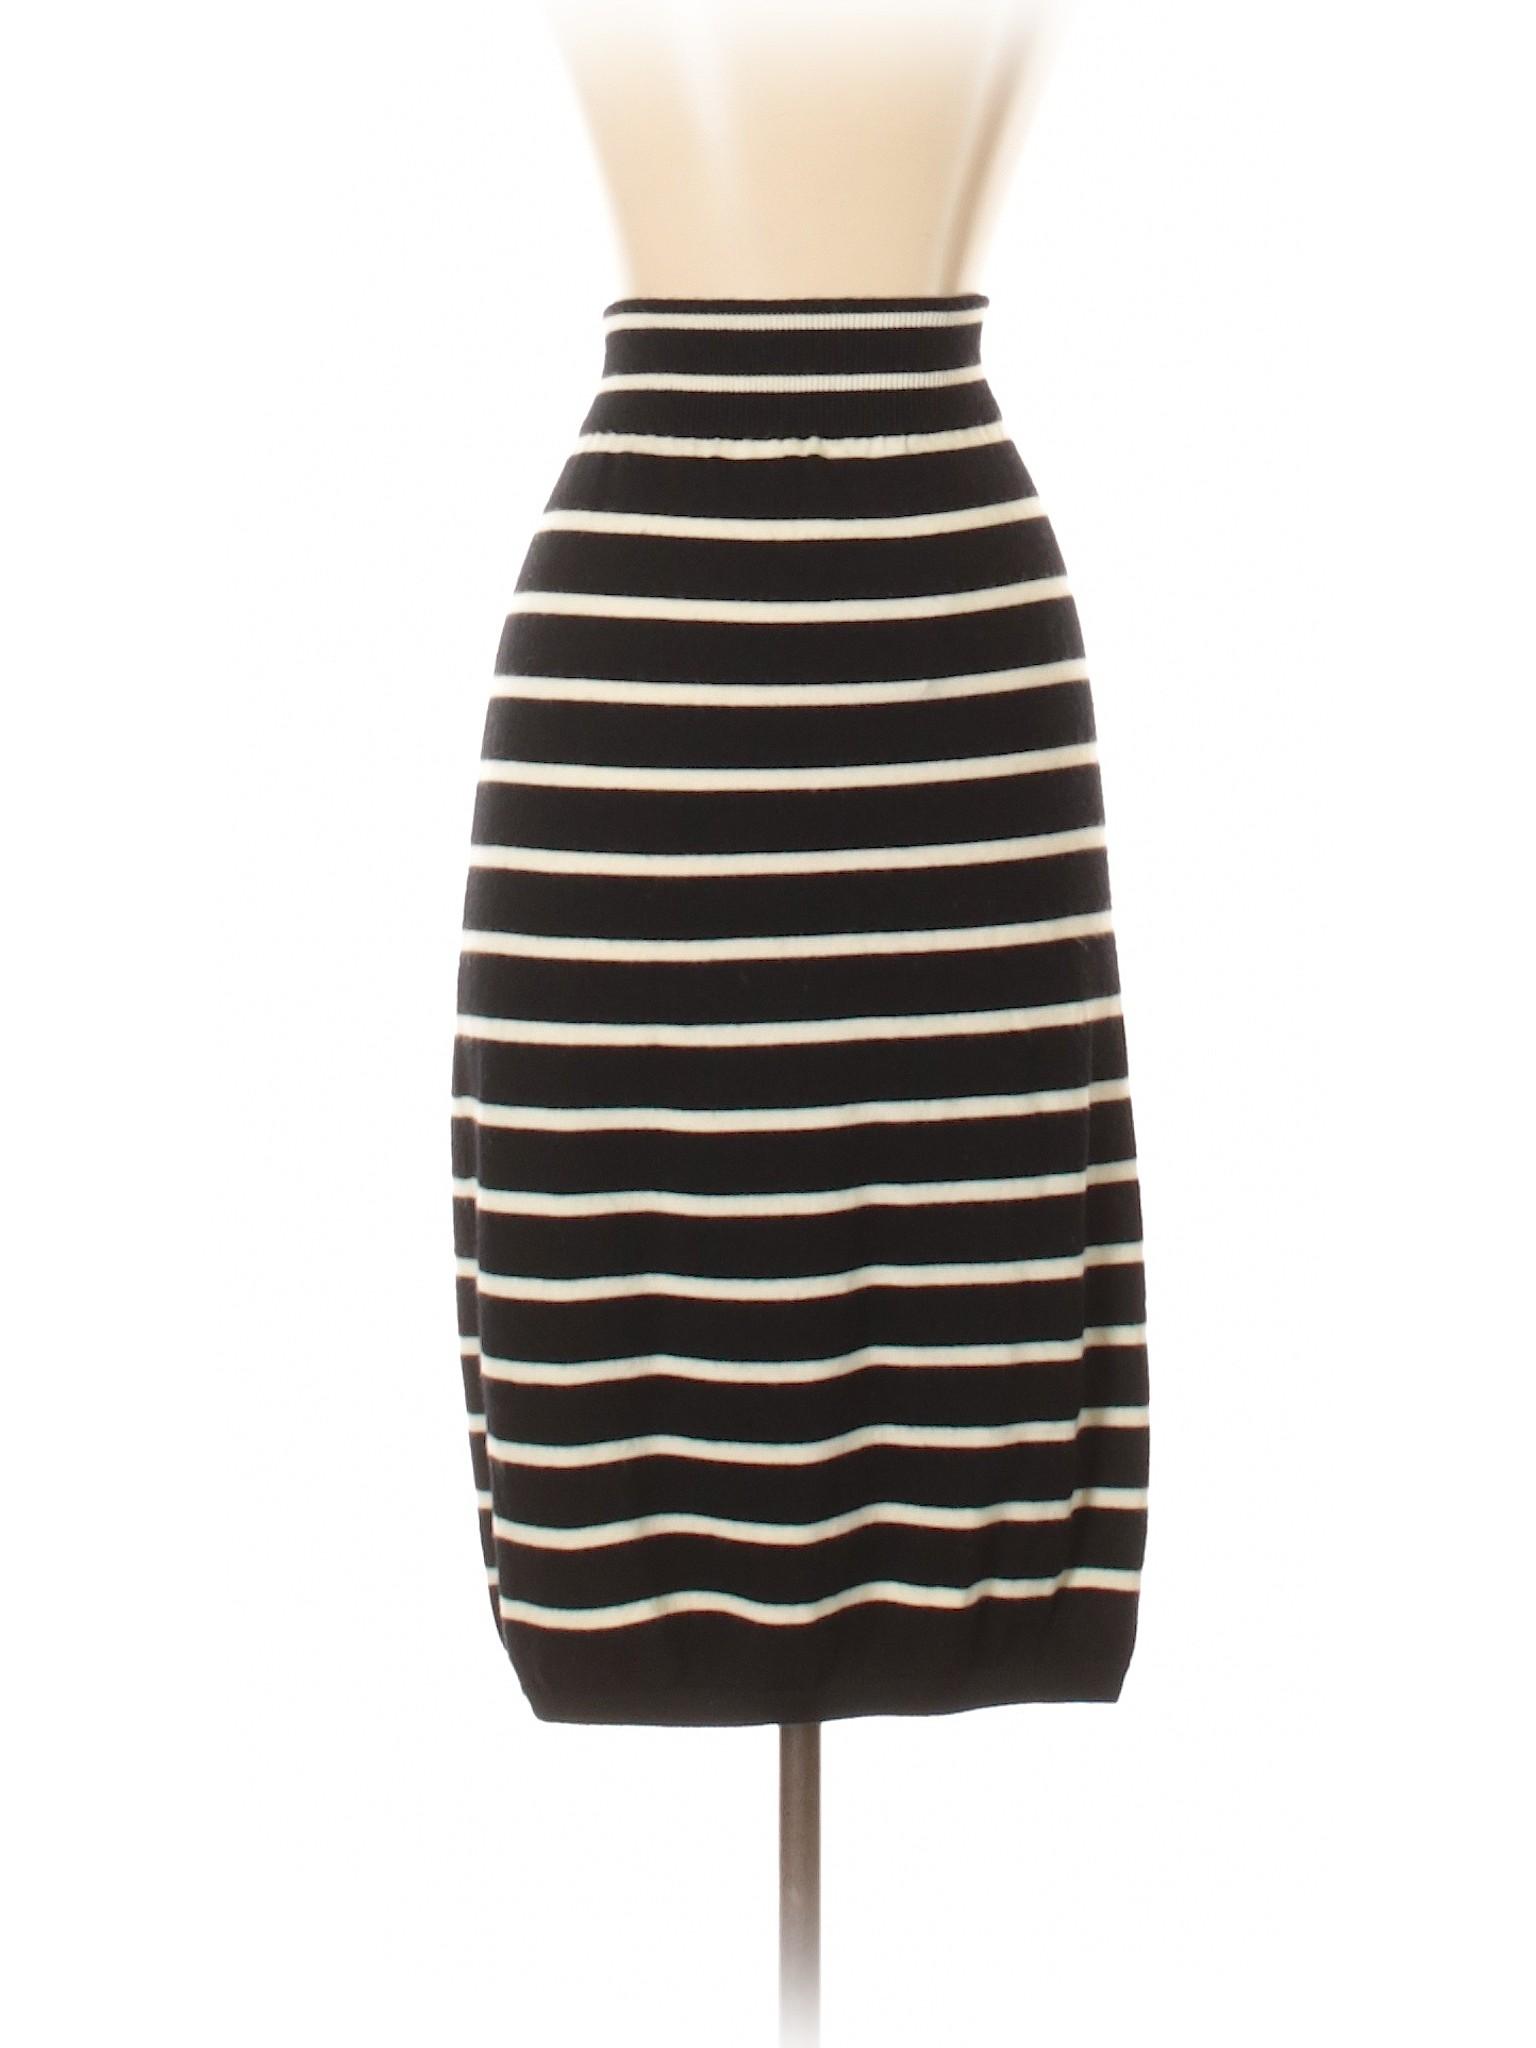 Skirt Wool leisure Boutique leisure Gap Boutique qpwXaSxBg